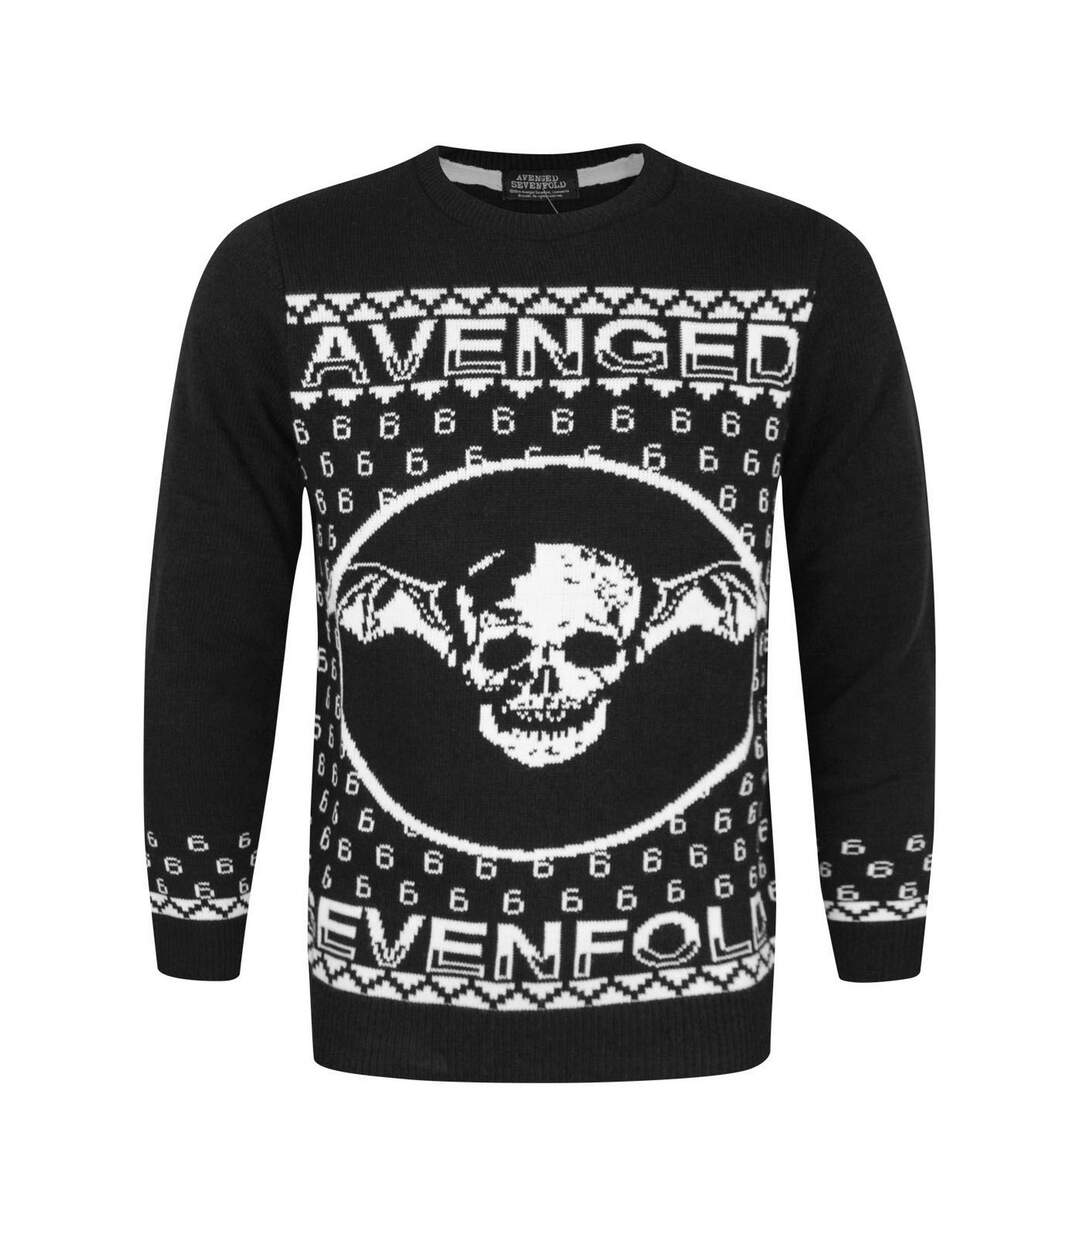 Avenged Sevenfold Unisex Adults Deathbat Christmas Jumper (Black) - UTNS4063